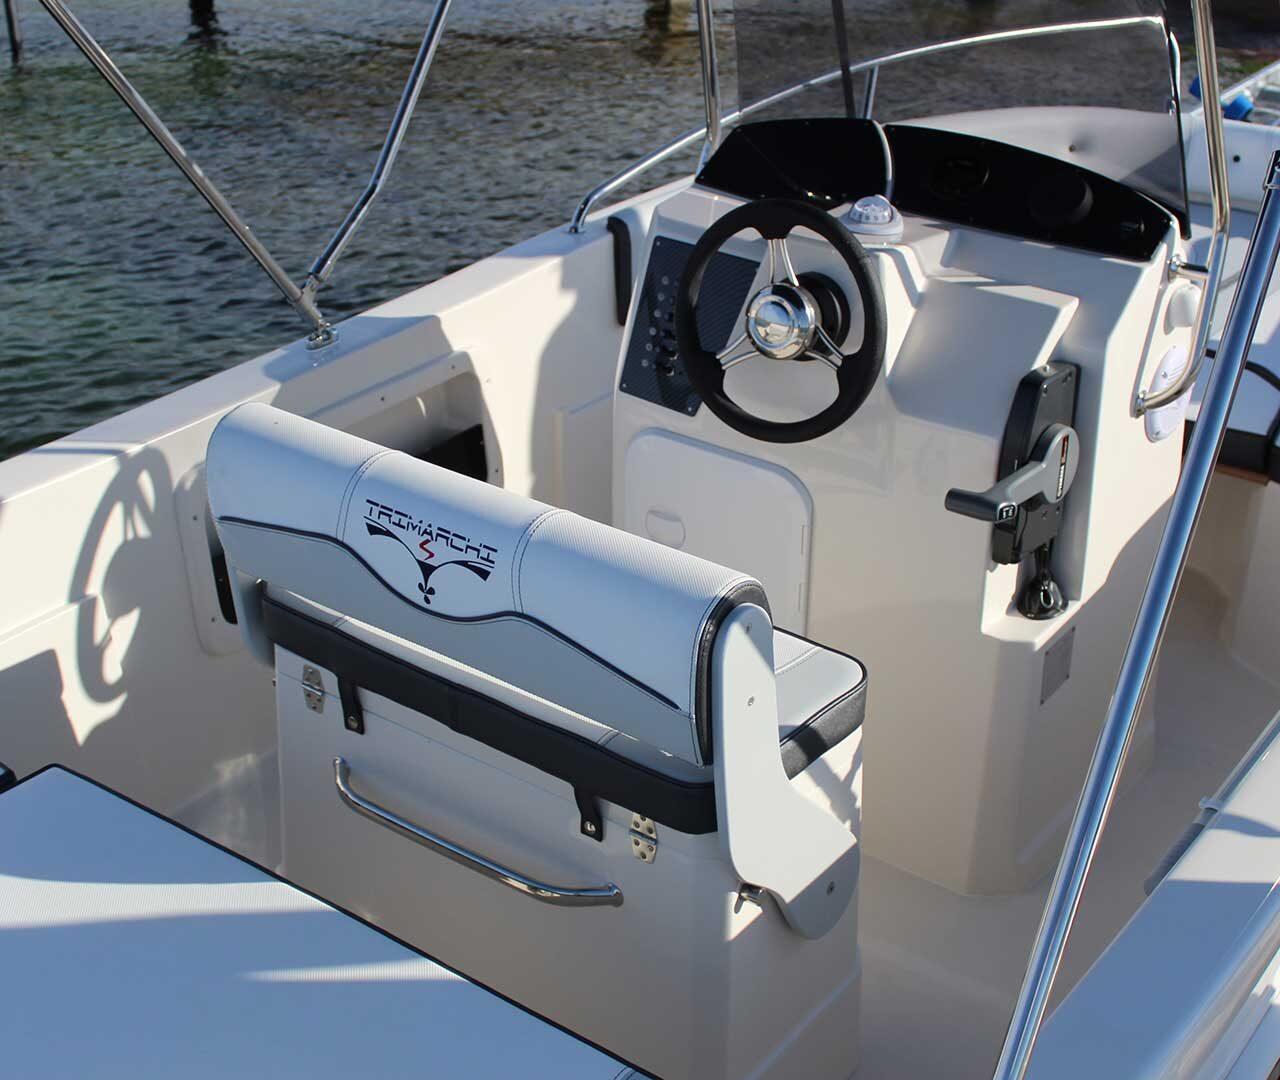 seaward-barca-medium-line3